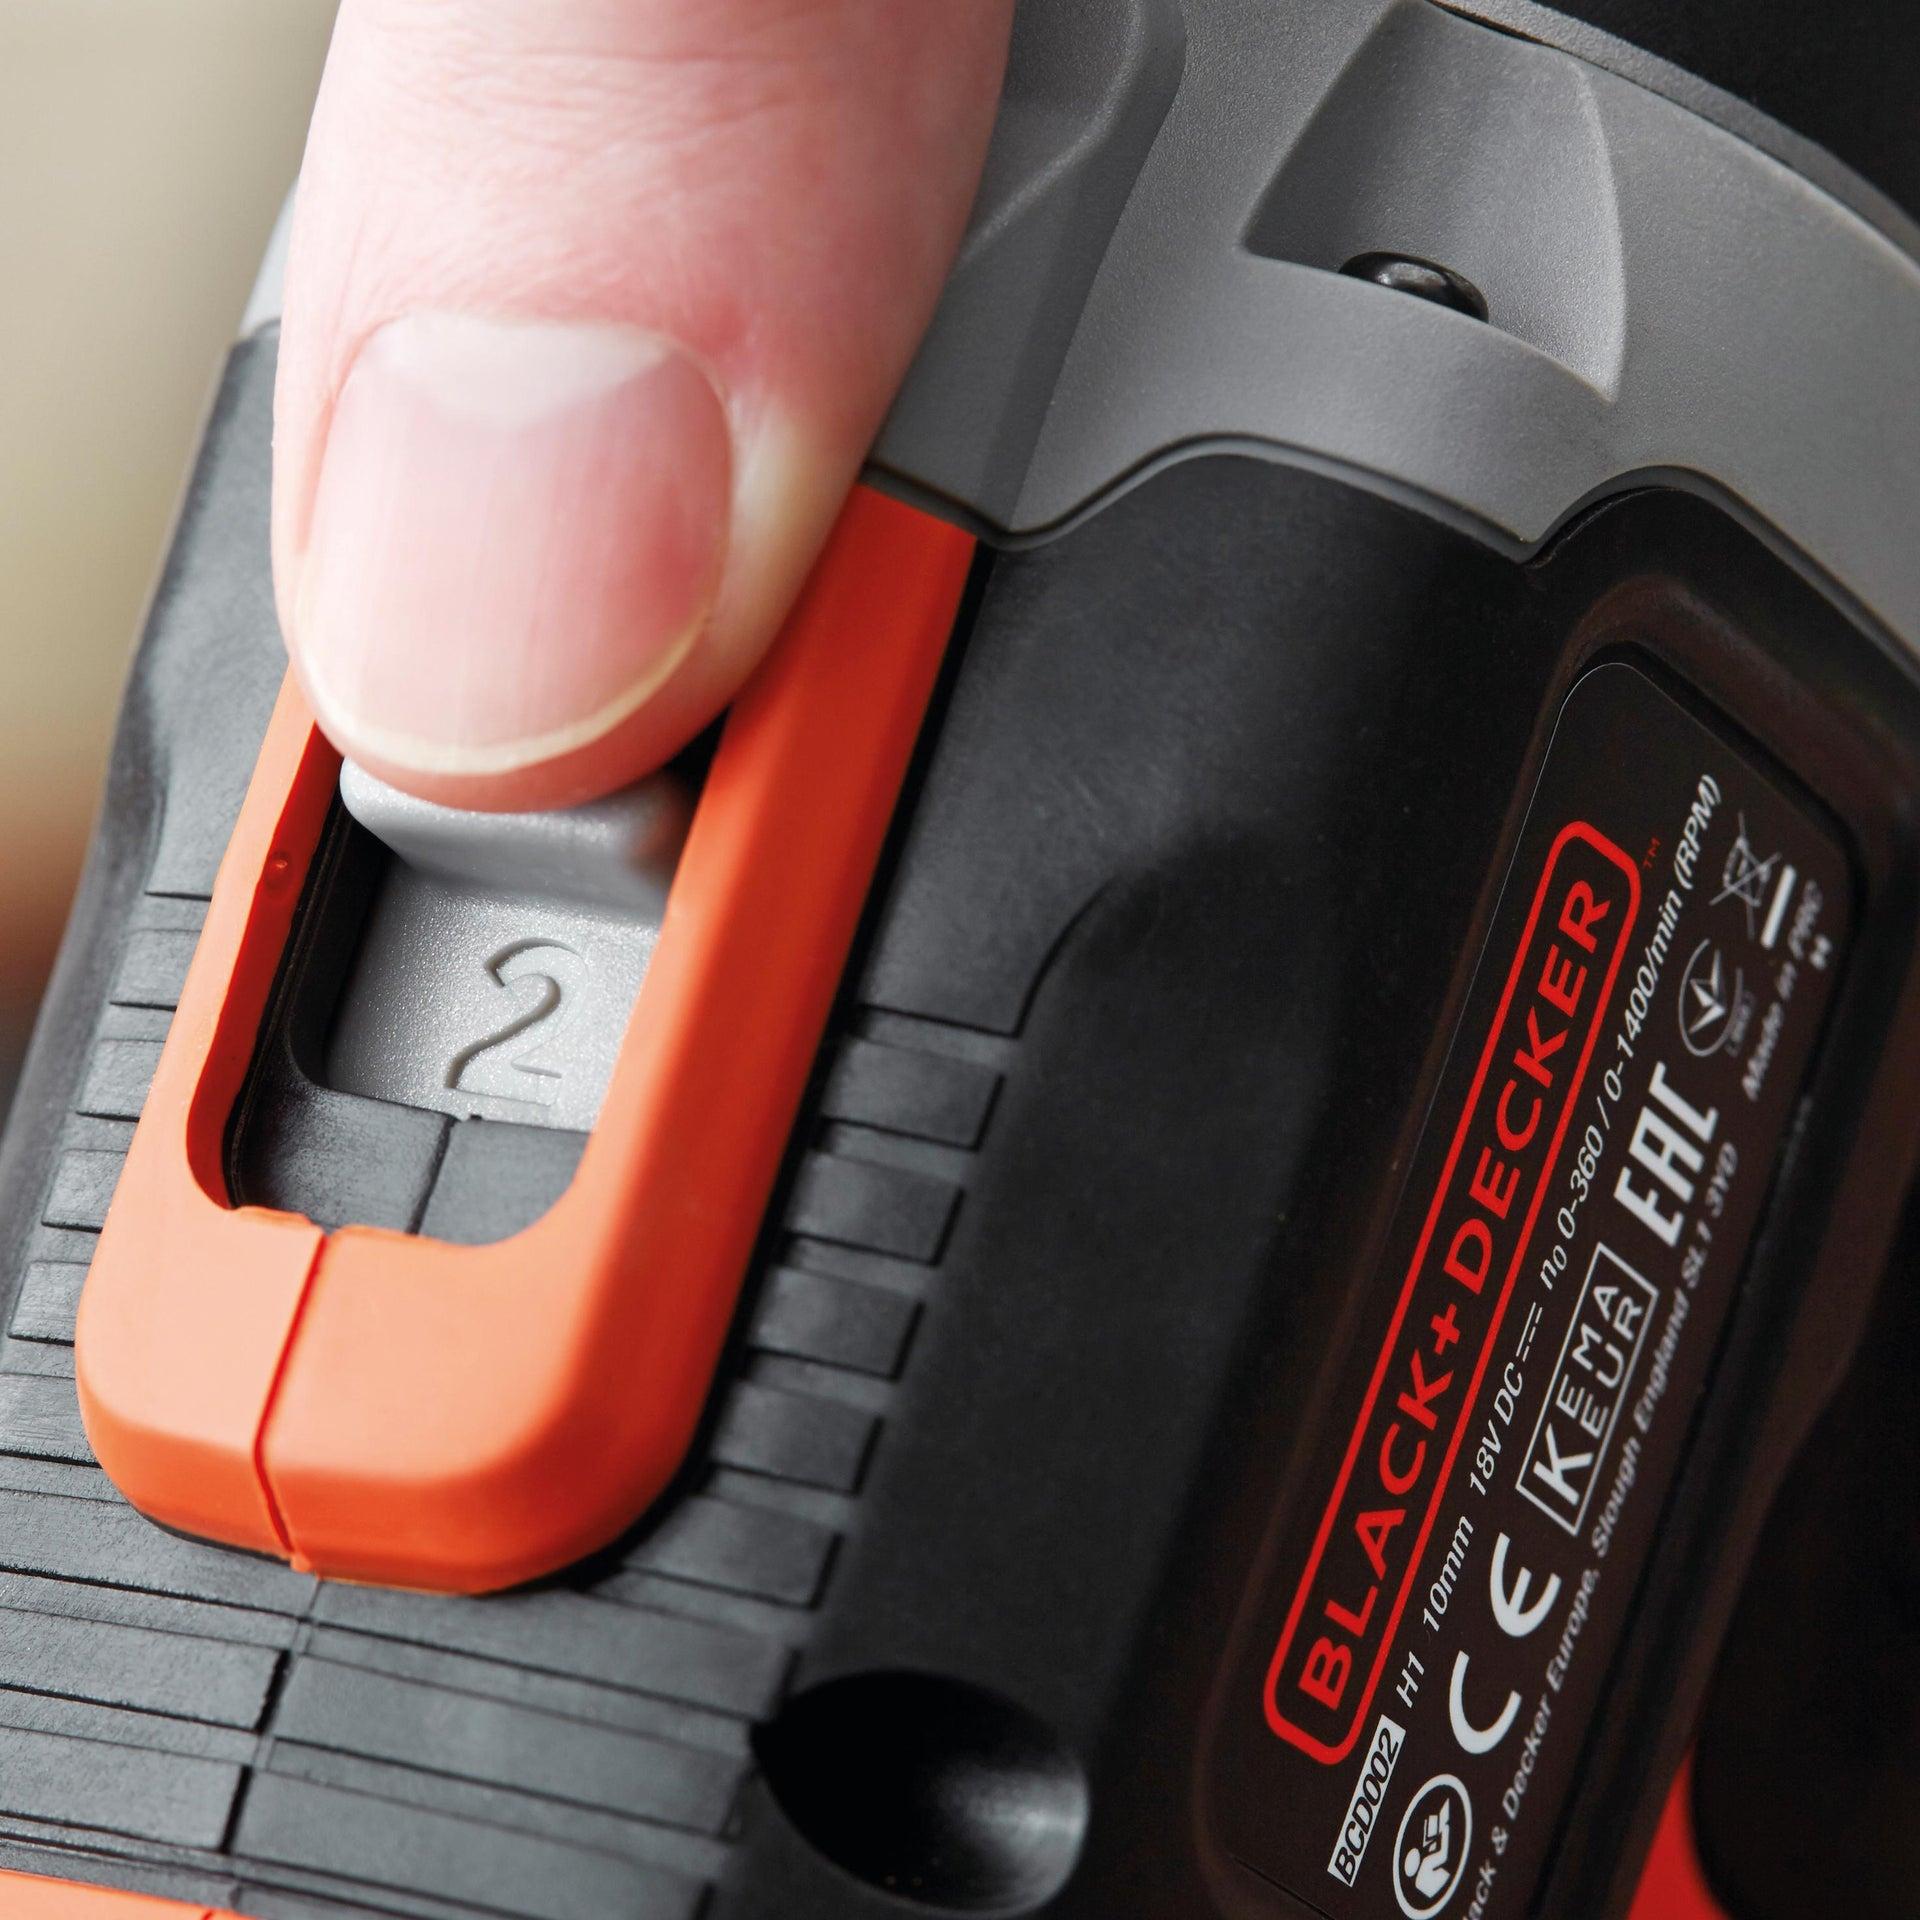 Trapano avvitatore a batteria BLACK + DECKER BCD003C2K 18 V, 1.5 Ah, 2 batterie - 4